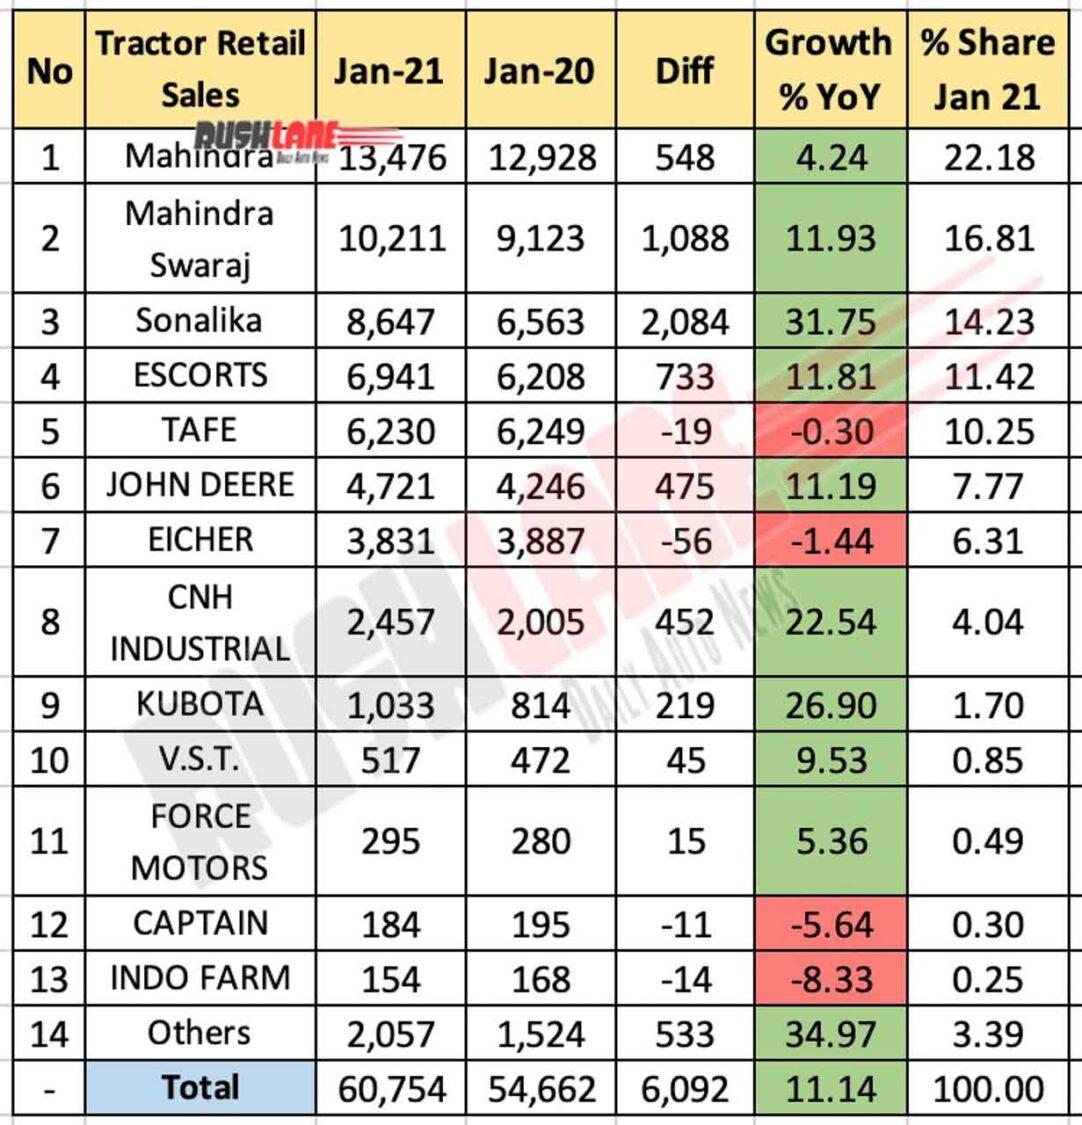 Tractor Retail Sales Jan 2021 vs Jan 2020 (YoY)